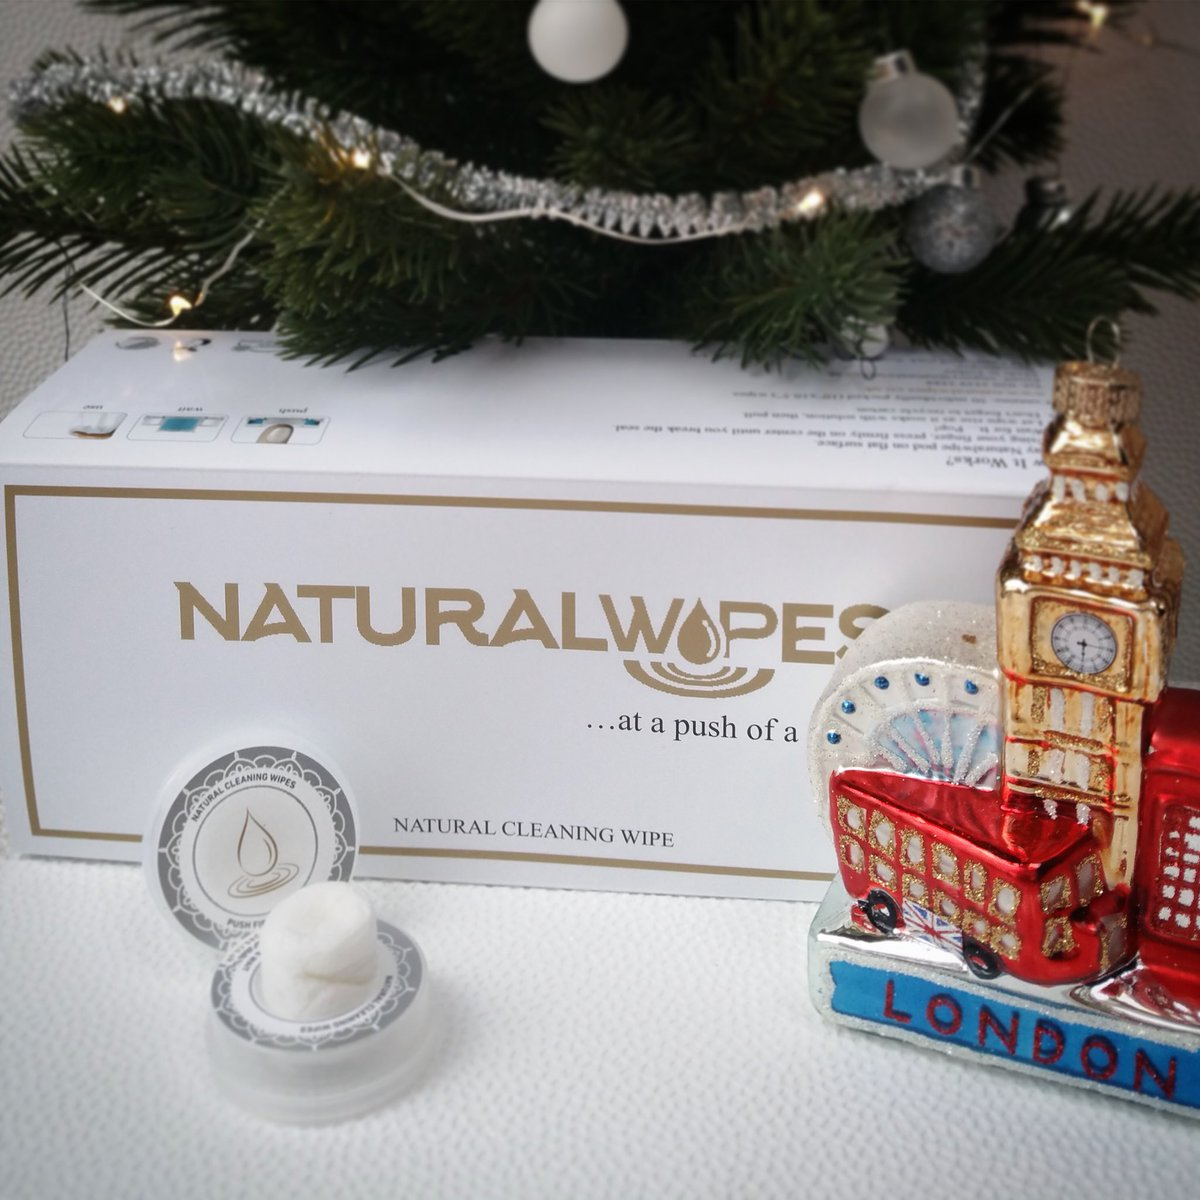 Naturalwipes Naturalwipes Twitter